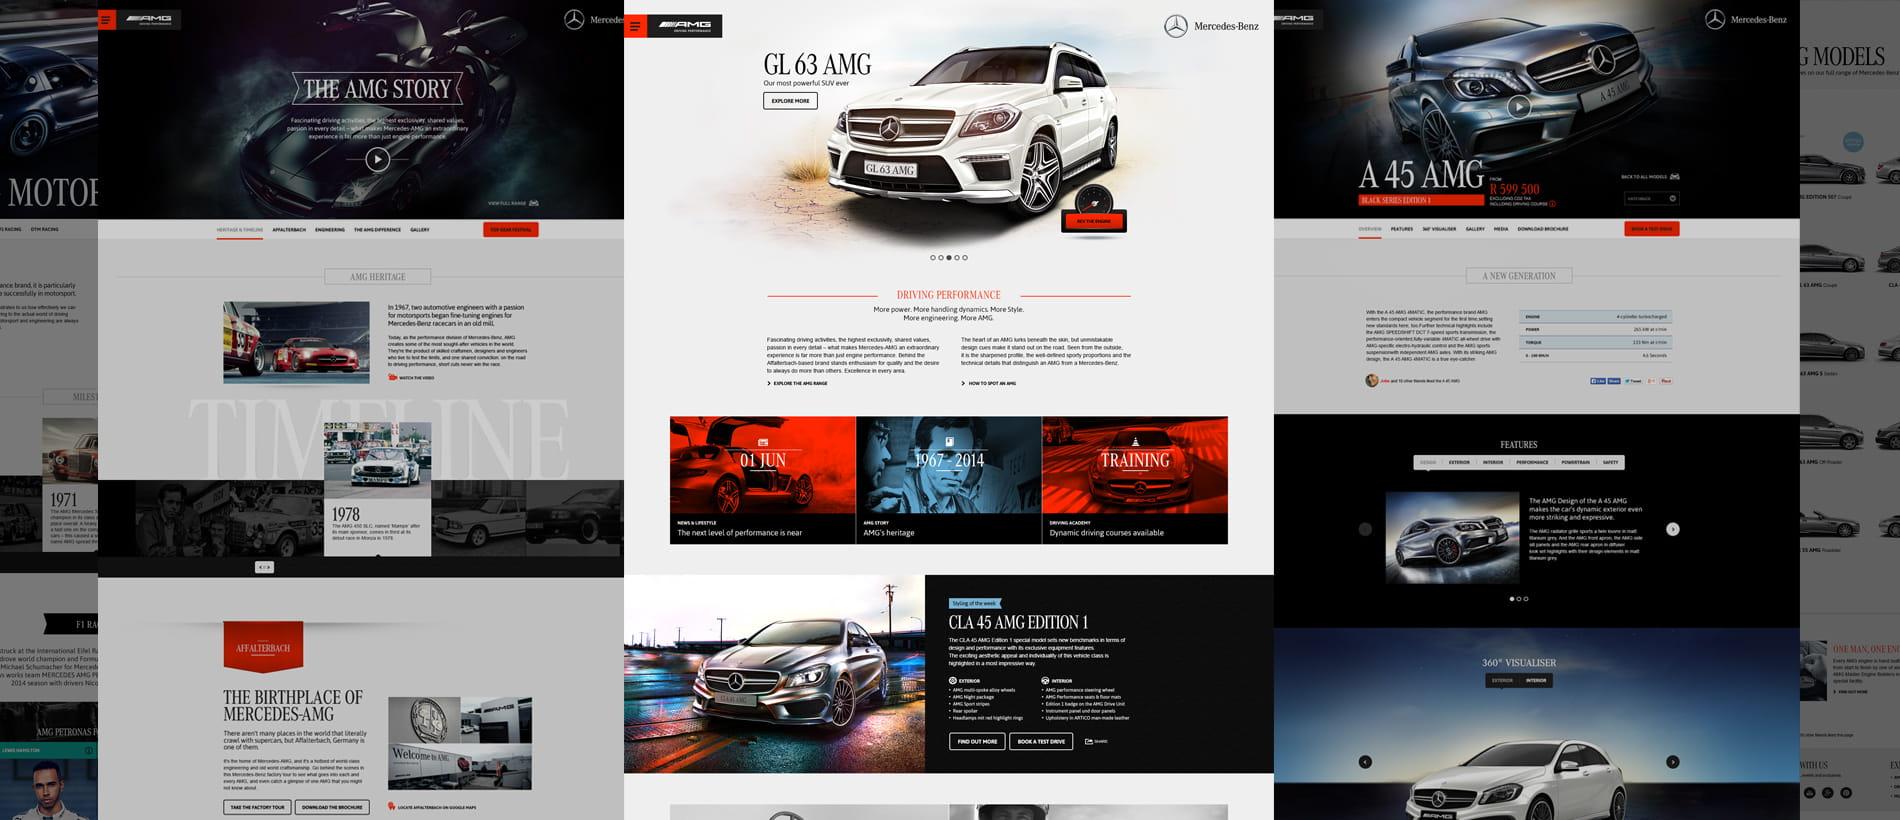 AMG Website Screens